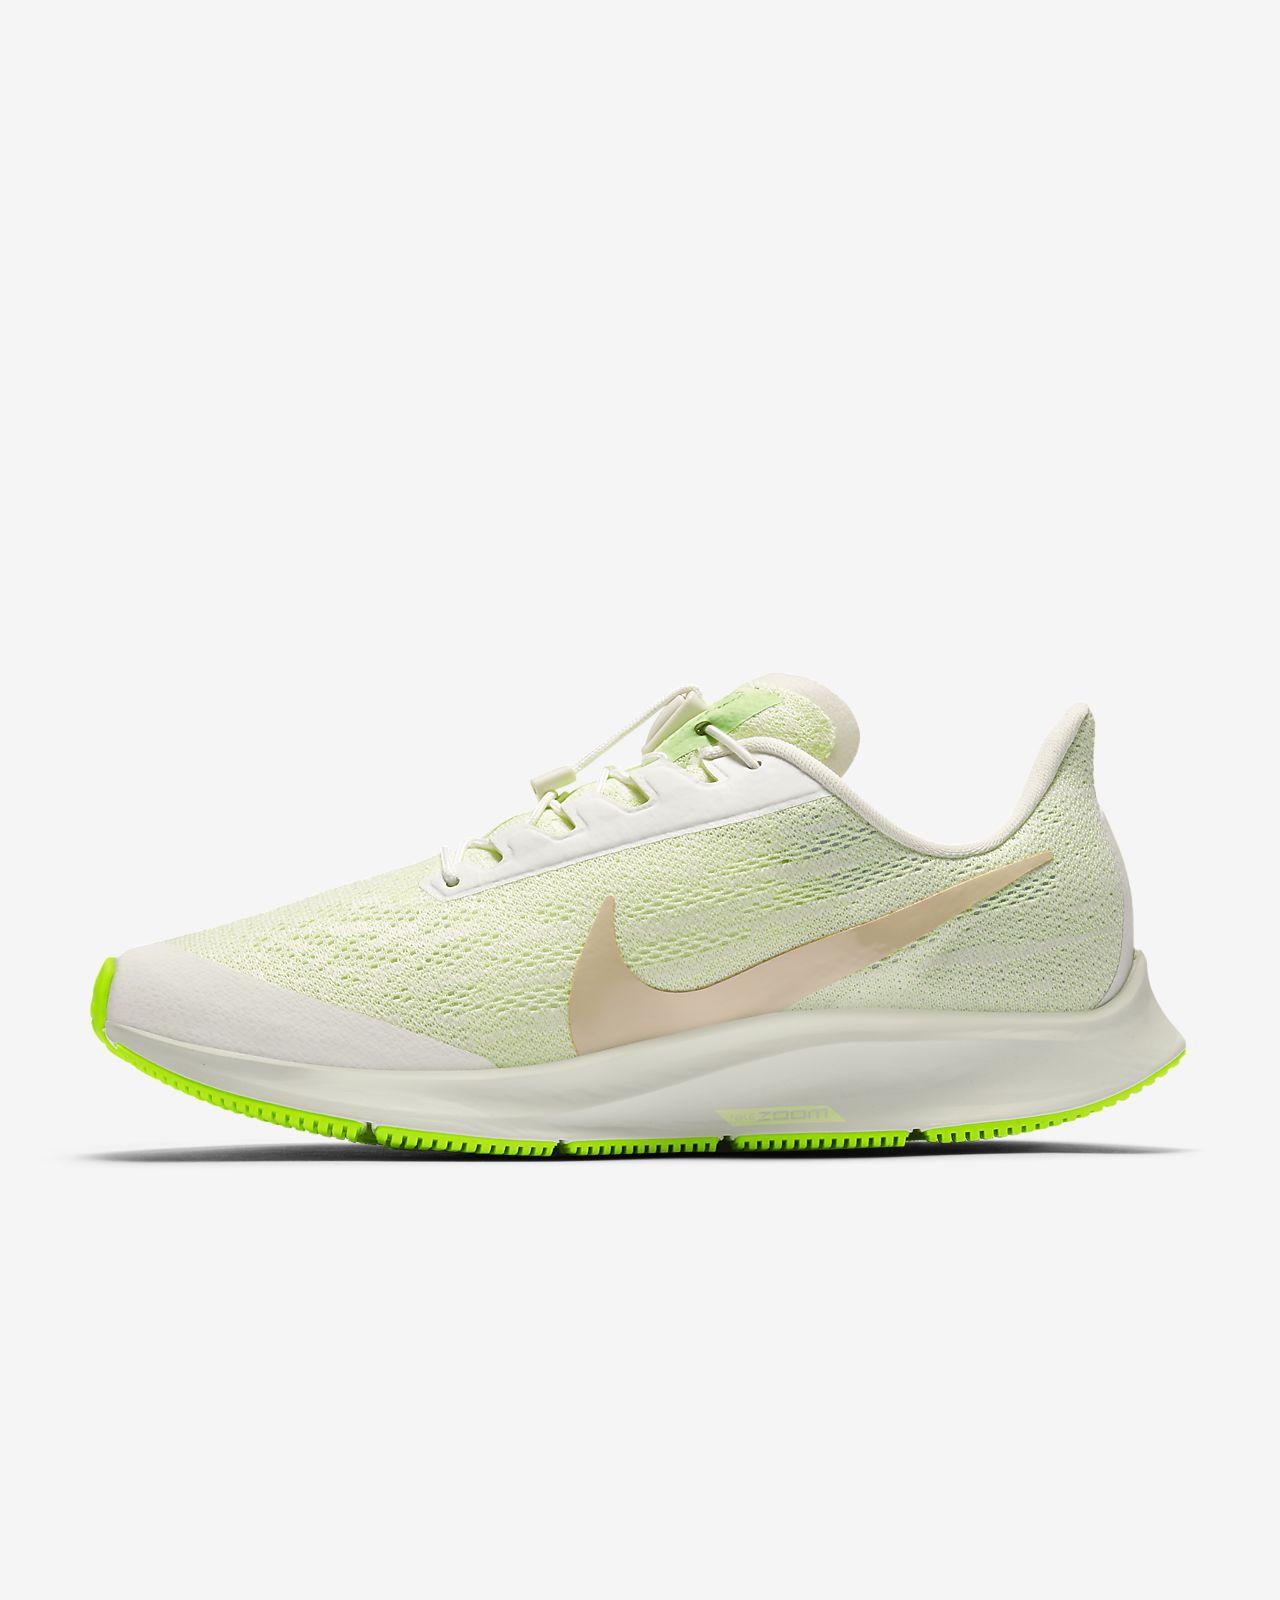 Nike Air Zoom Pegasus 36 FlyEase Women's Running Shoe (Wide)